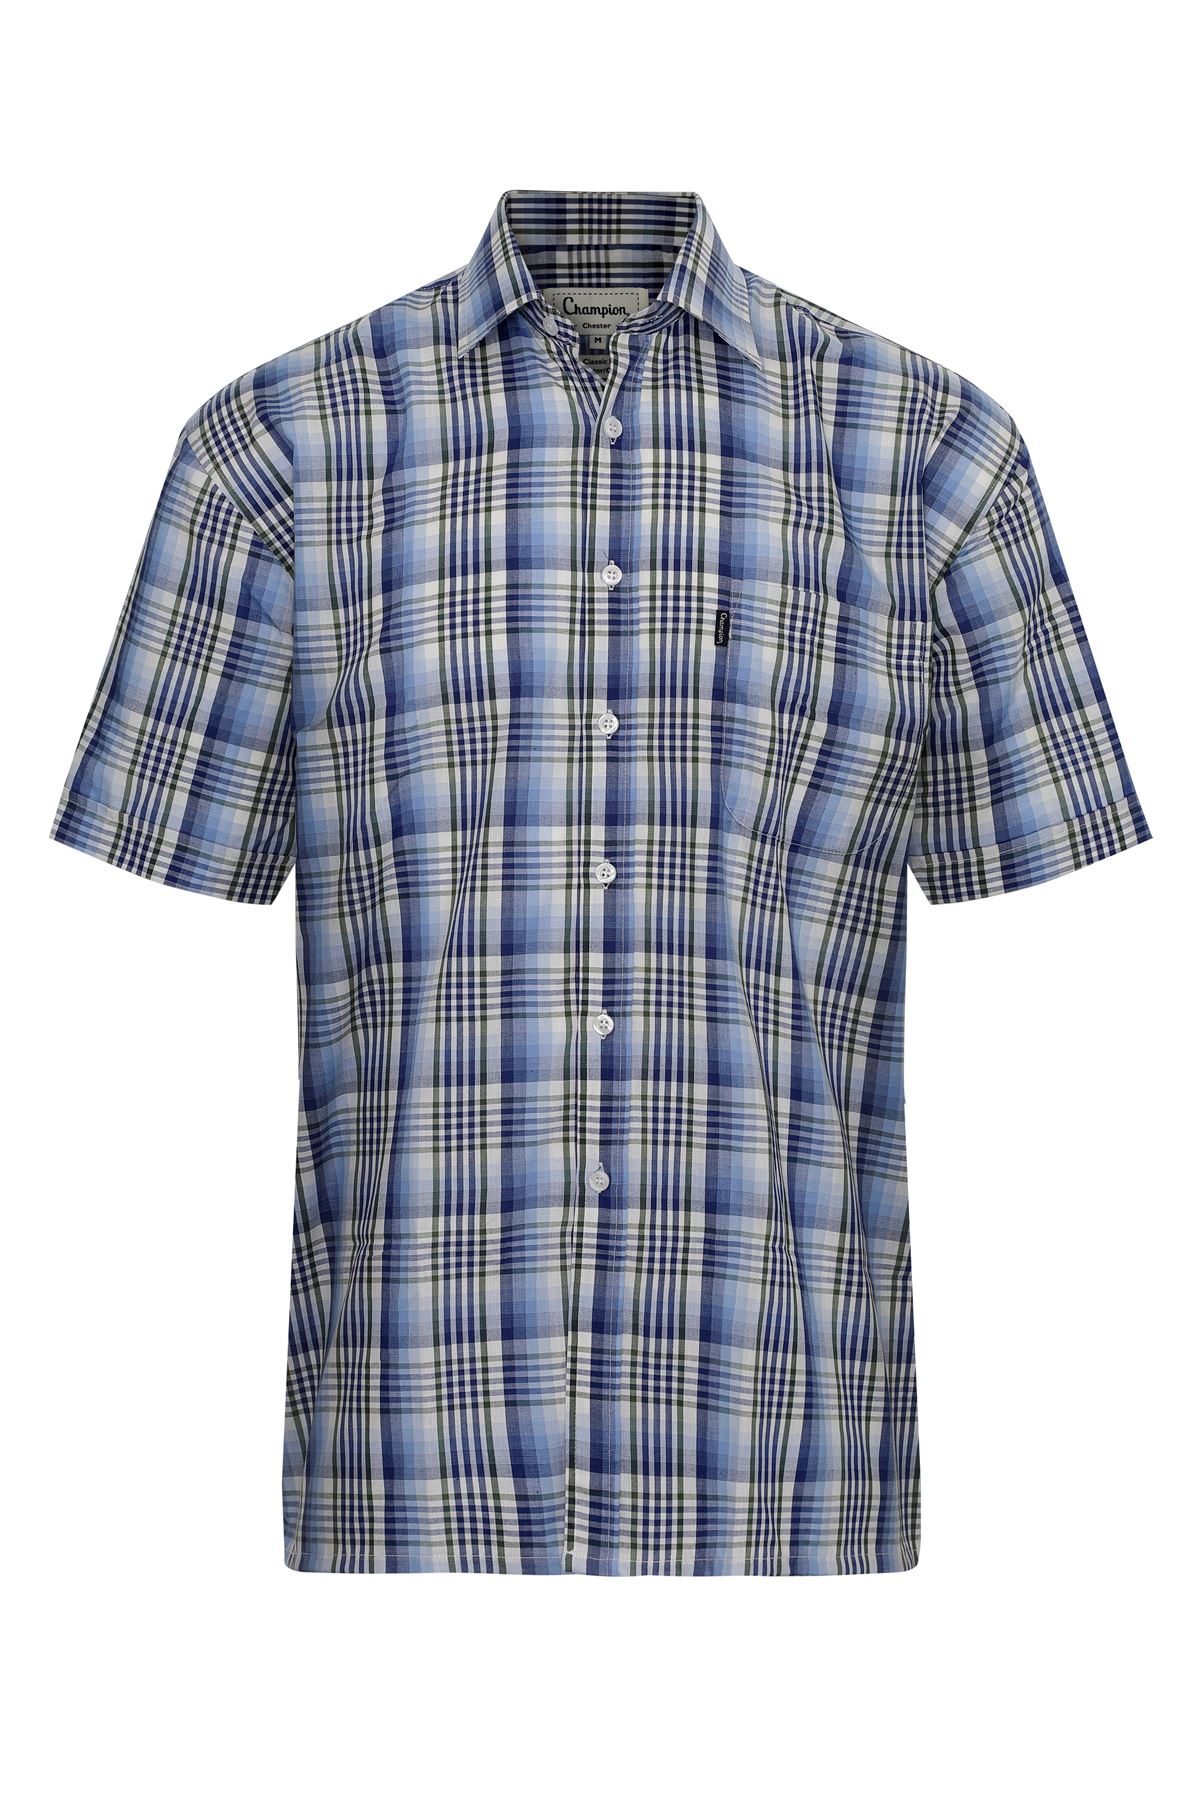 Champion-Mens-Shirt-Check-Short-Sleeve-Polycotton-Country-Casual thumbnail 3